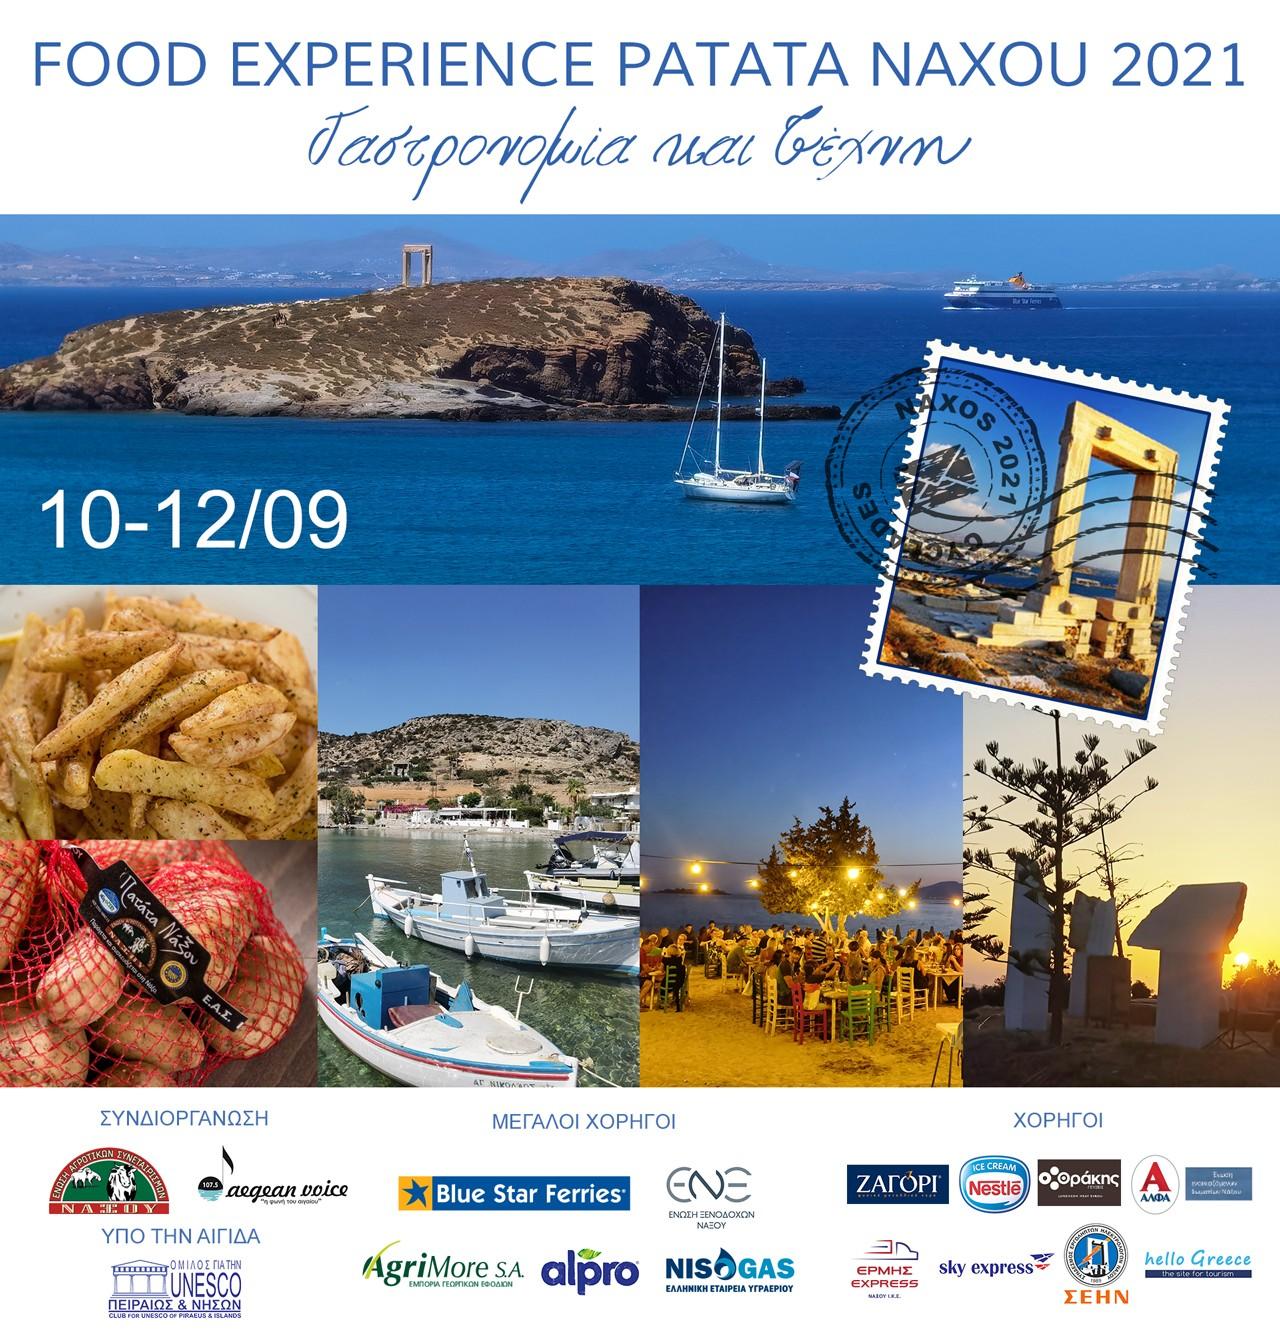 Food Experience Patata Naxou 2021 - www.olivemagazine.gr